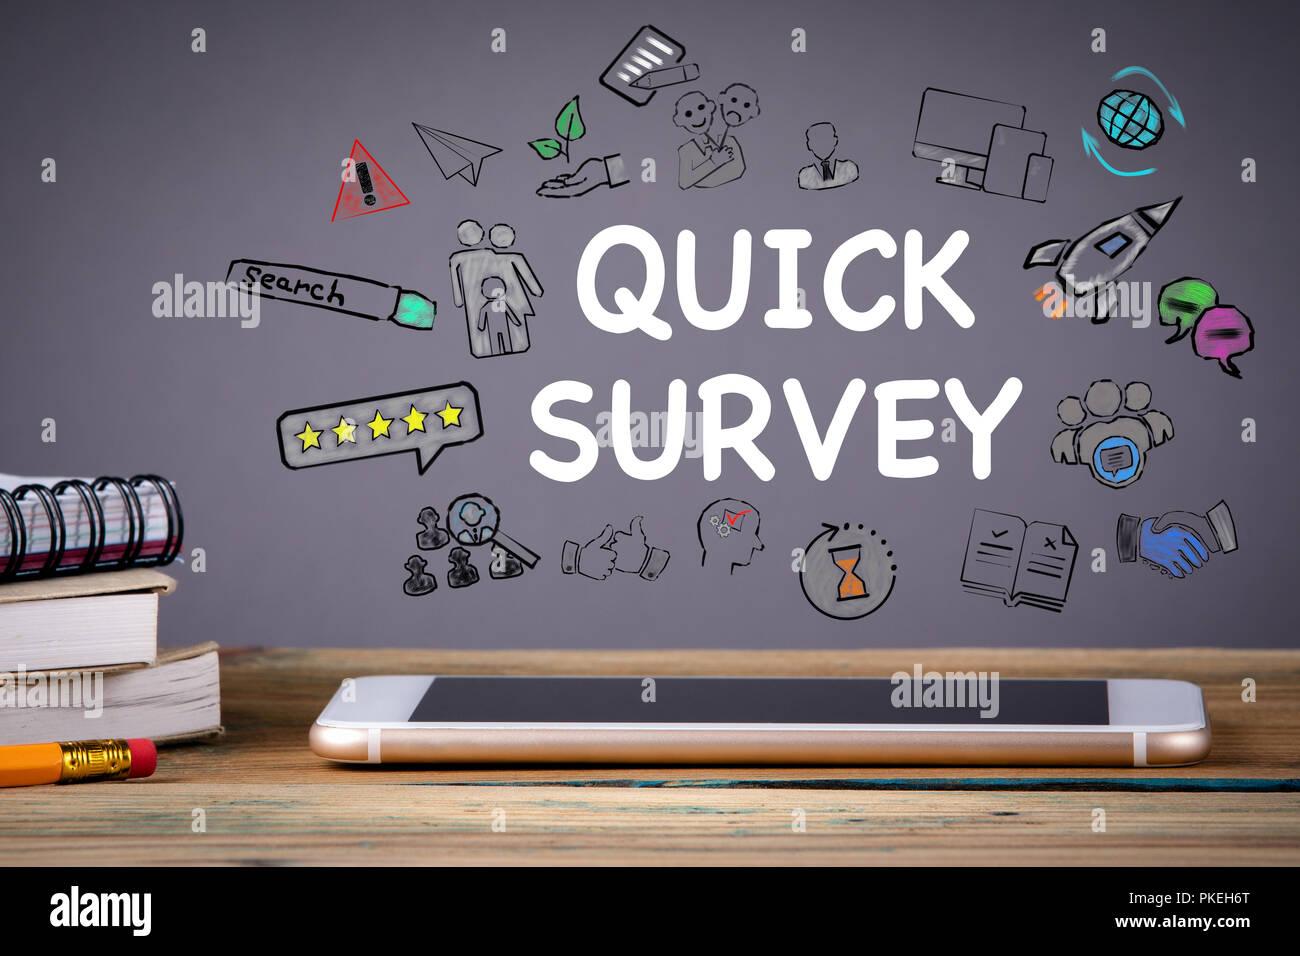 quick survey, Media Technology concept - Stock Image